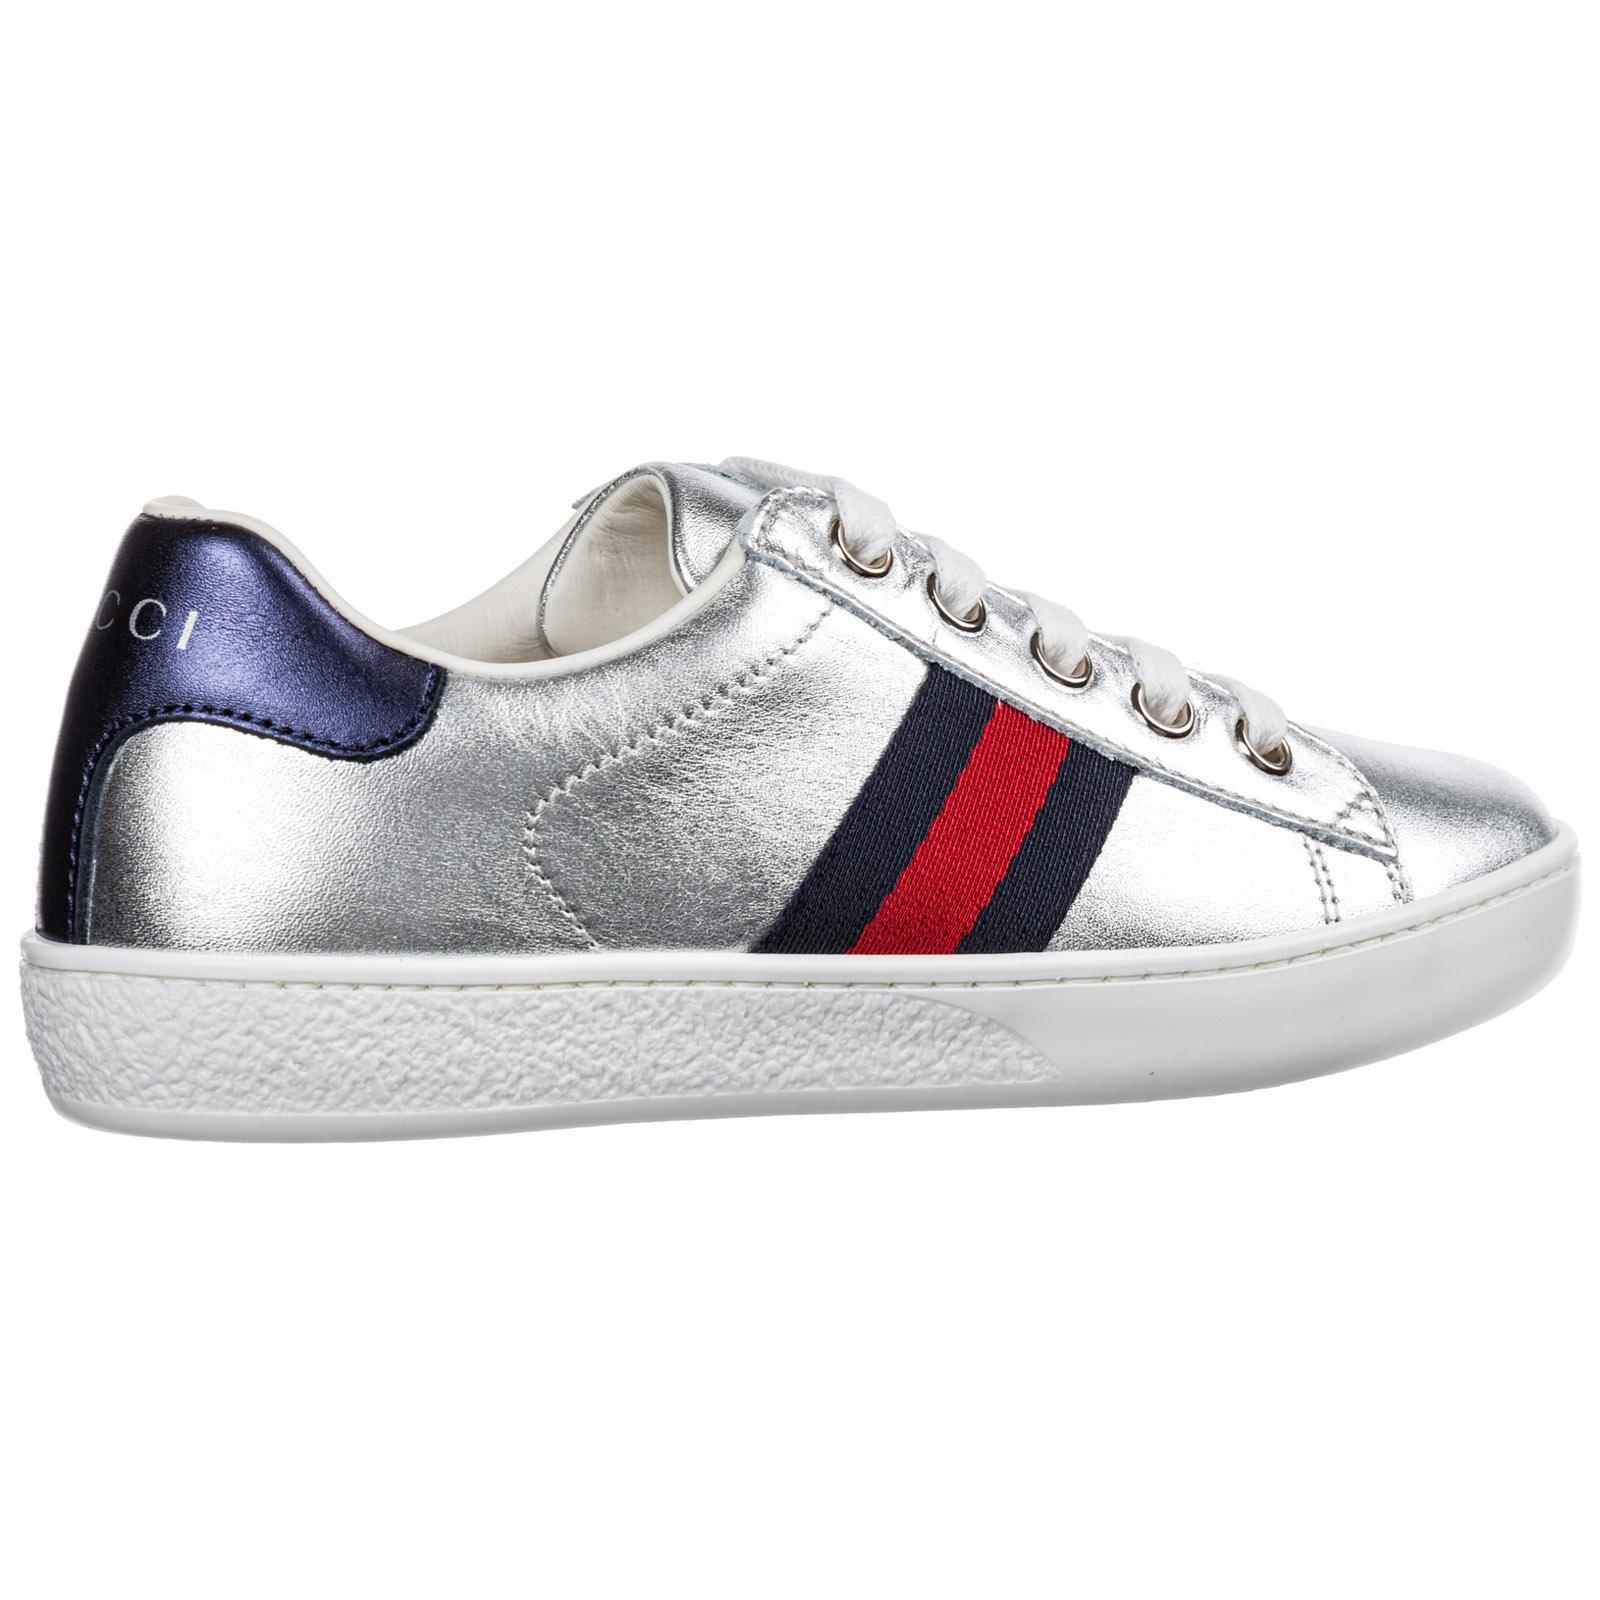 hochwertiges Design Geschicktes Design modischer Stil Gucci Leather Babyschuhe Sneakers Kinder Baby Schuhe Mädchen Leder ...